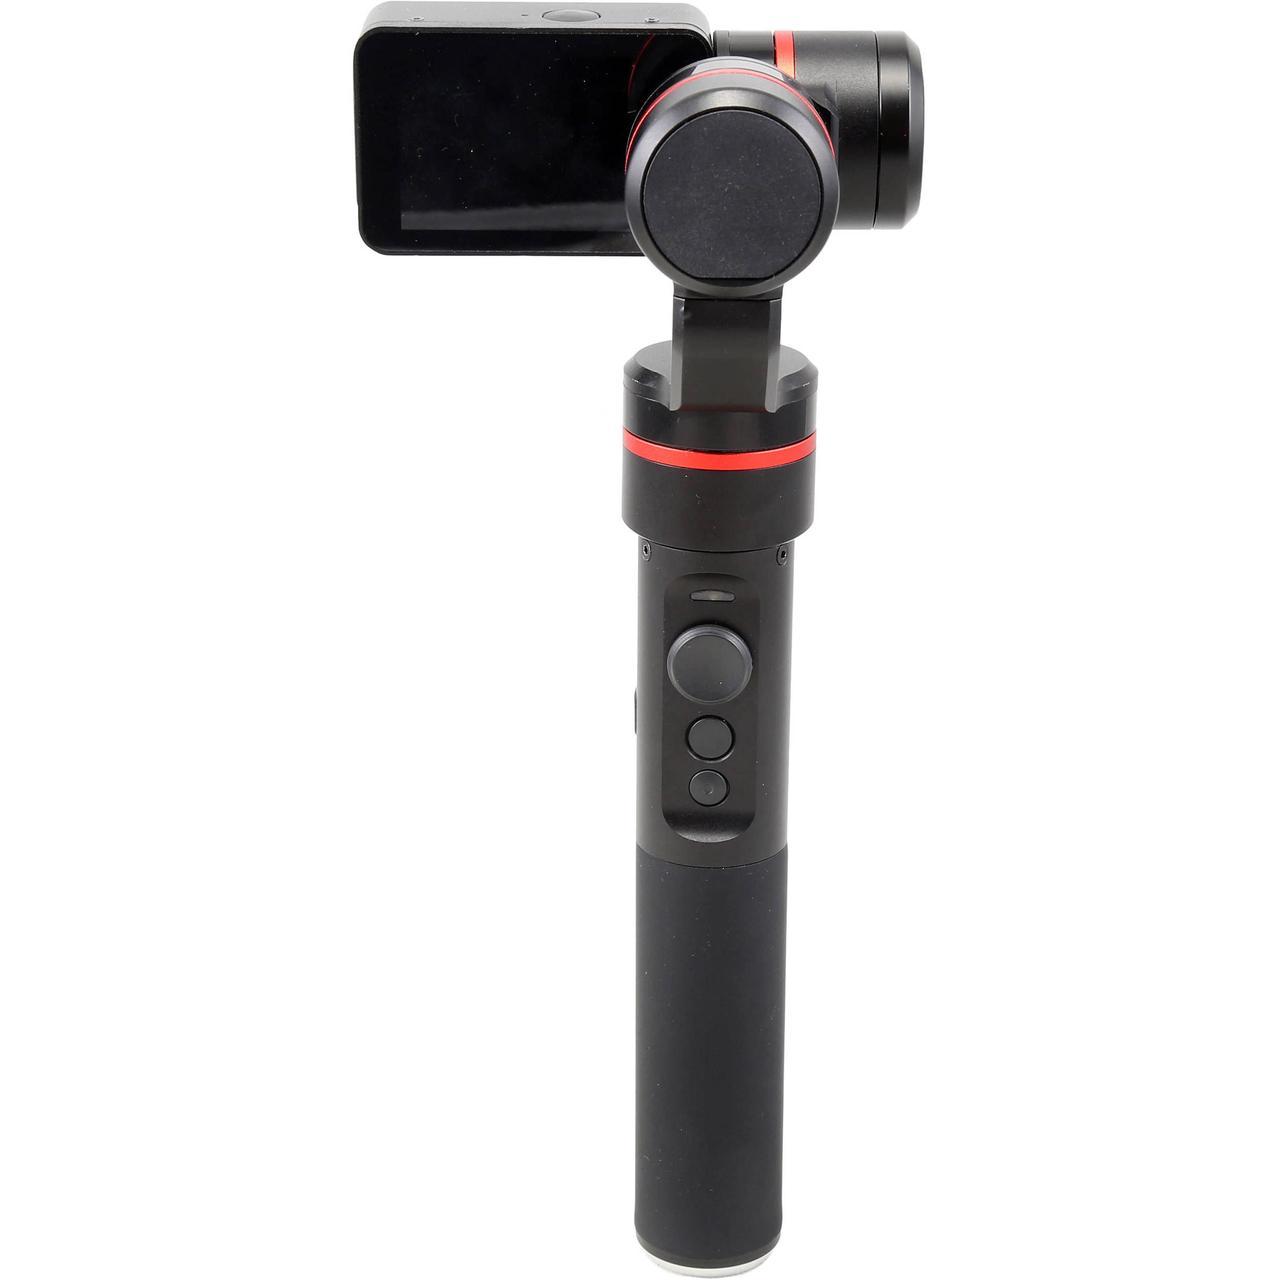 Ручной 3-х осевой стедикам Feiyu Summon+ 3-Axis Handheld Gimbal with 4K Camera (FES4KP)